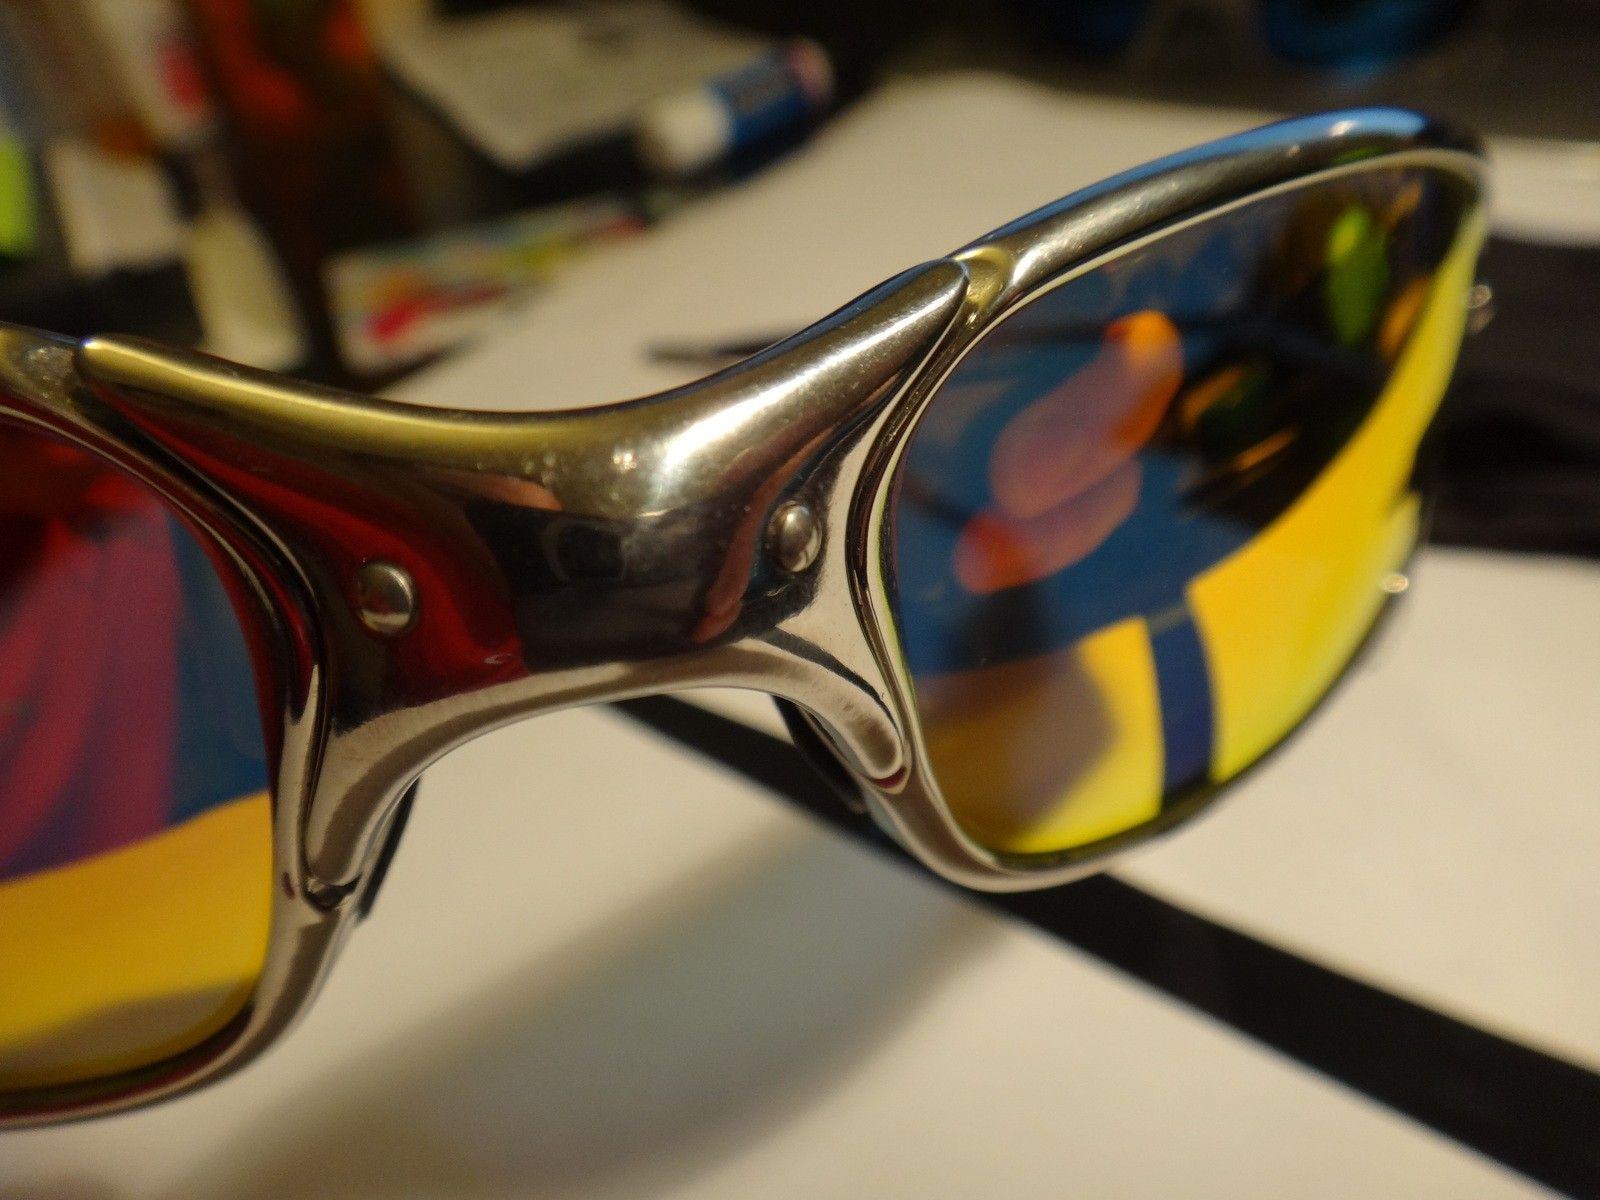 Polished juliet w/ fire iridium polarized lens $365 contUS - DSC07481.JPG